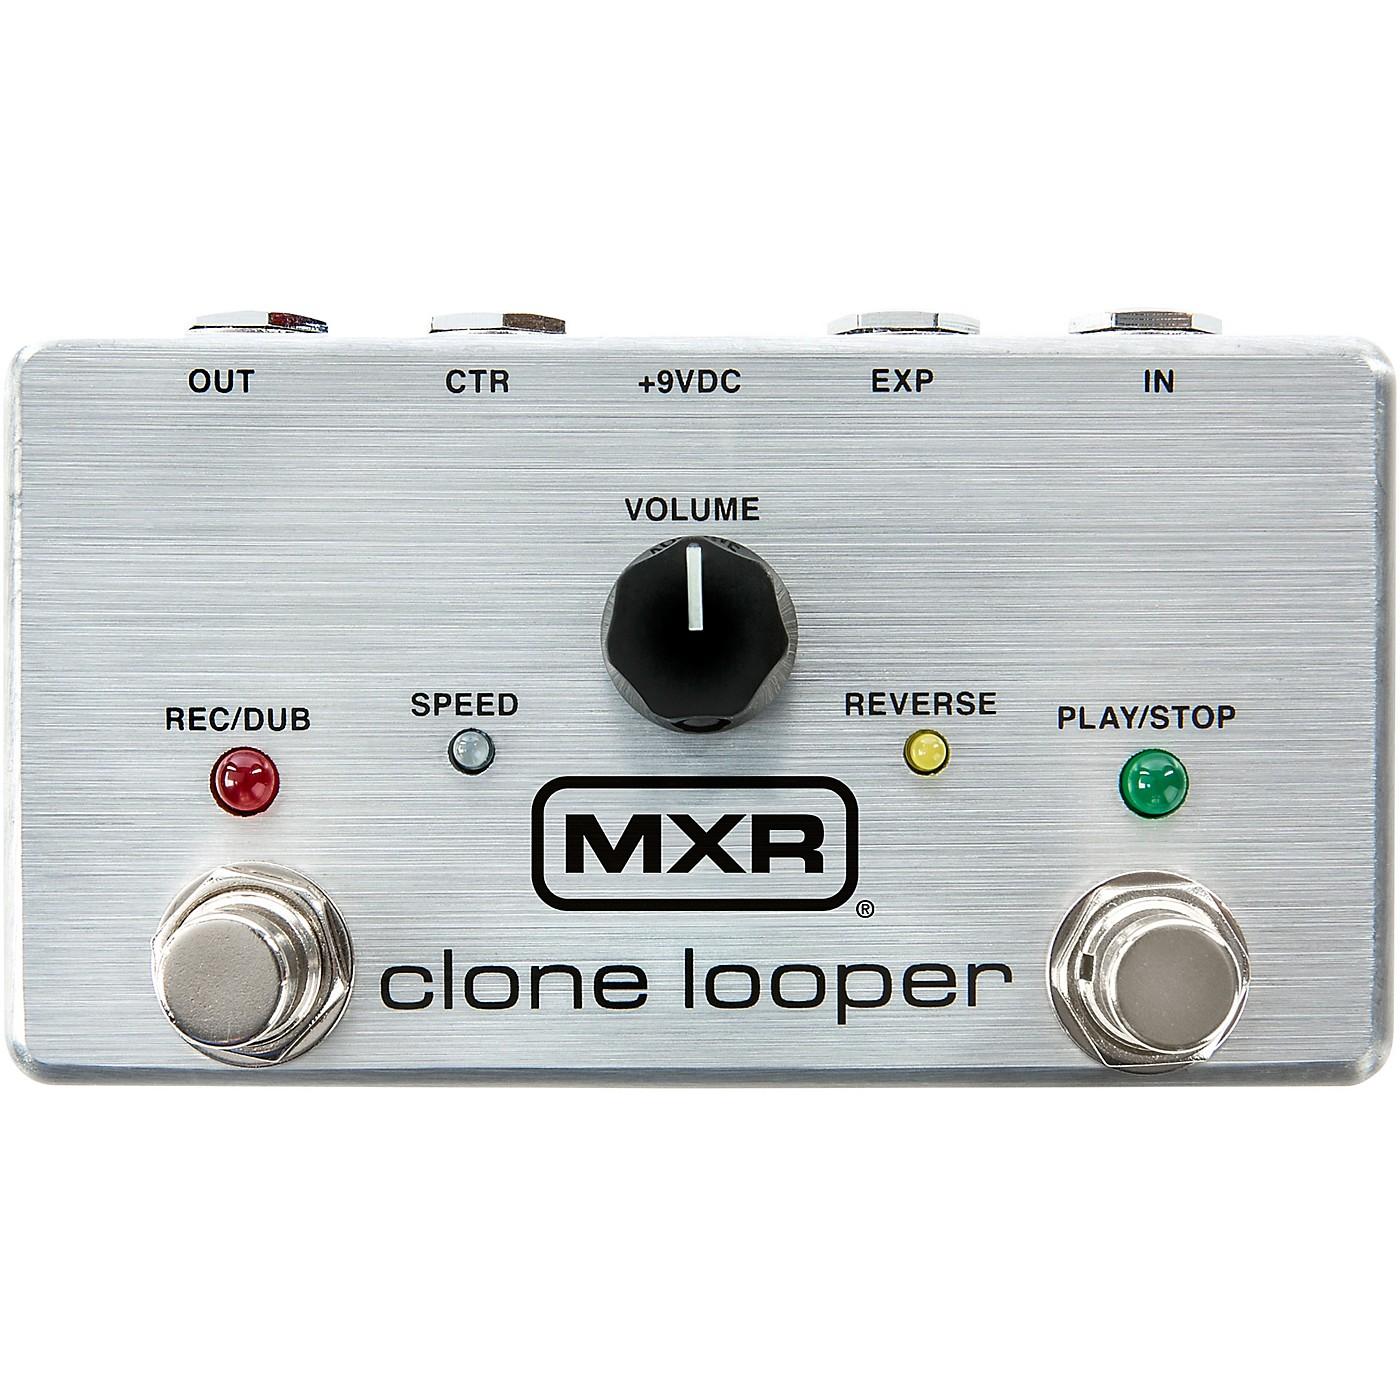 MXR M303 Clone Looper Effects Pedal thumbnail